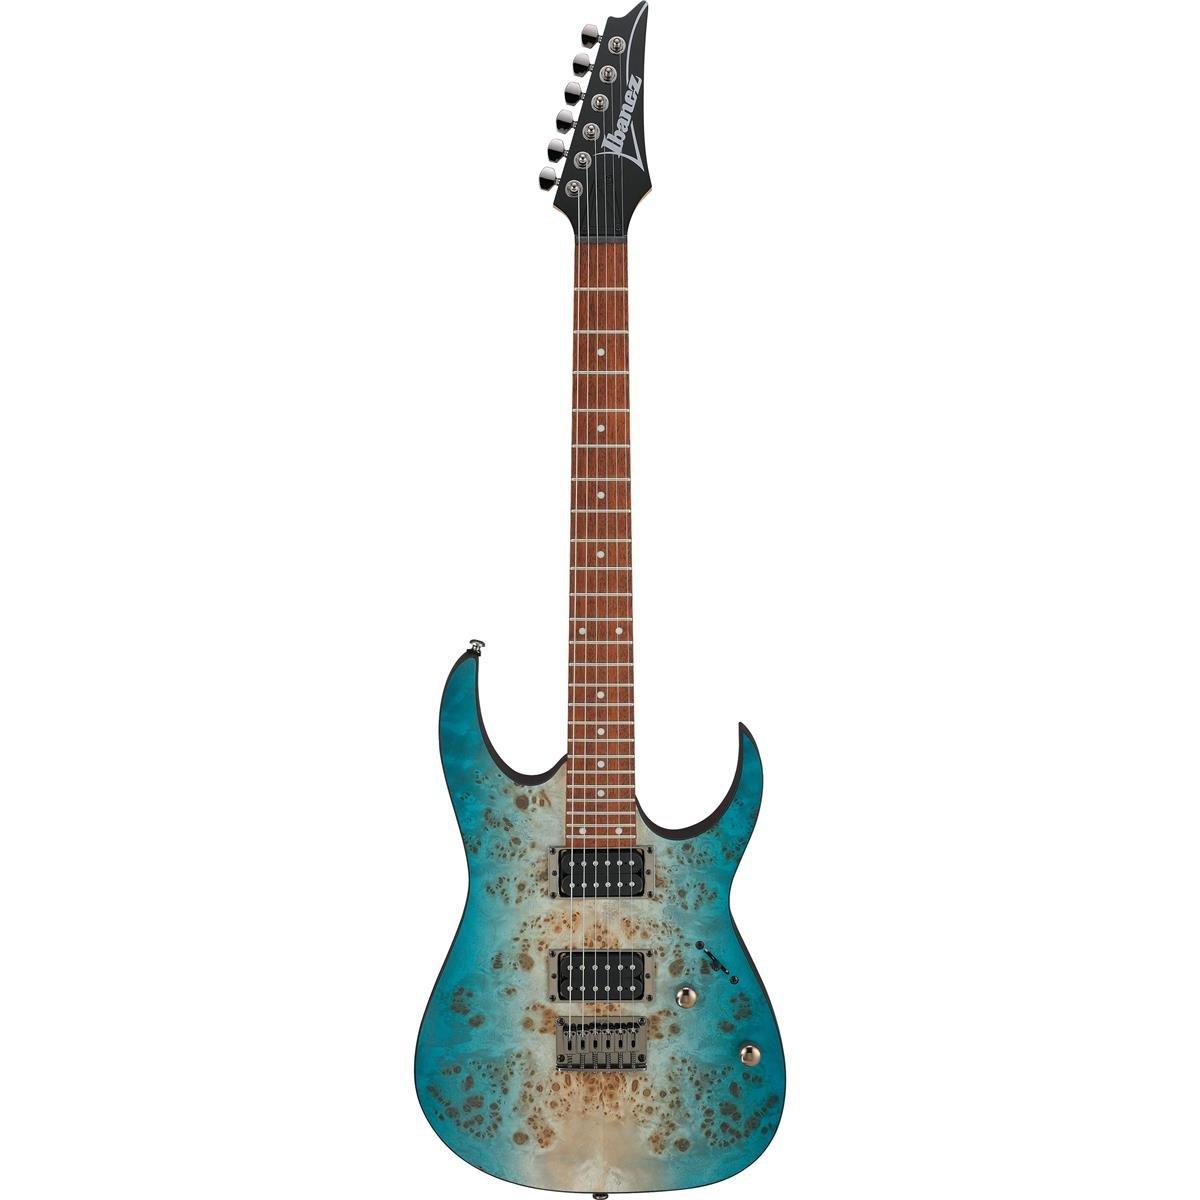 (Pre-Order) Ibanez RG421PBCHF RG Series Electric Guitar - Caribbean Shoreline Flat